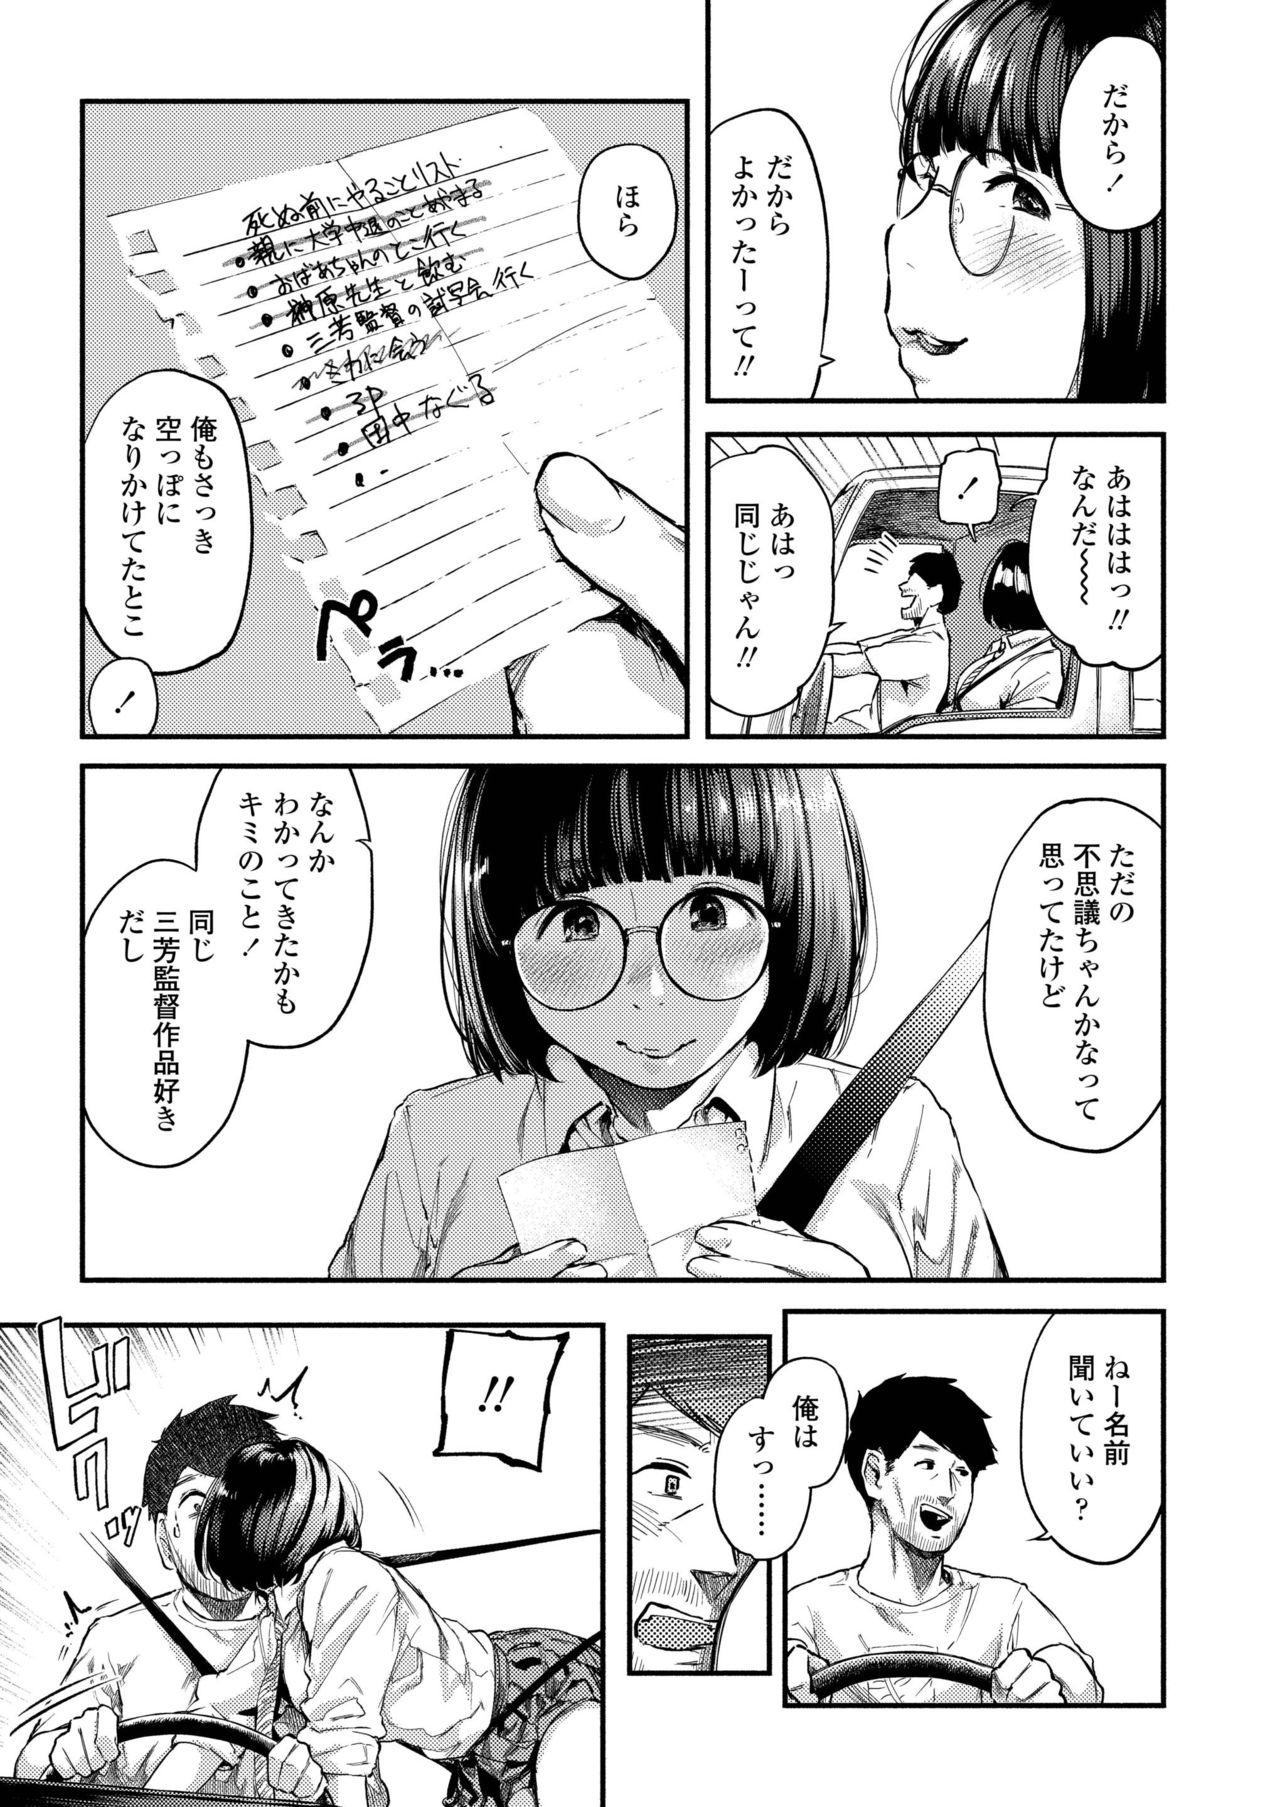 COMIC AOHA 2019 Haru 278